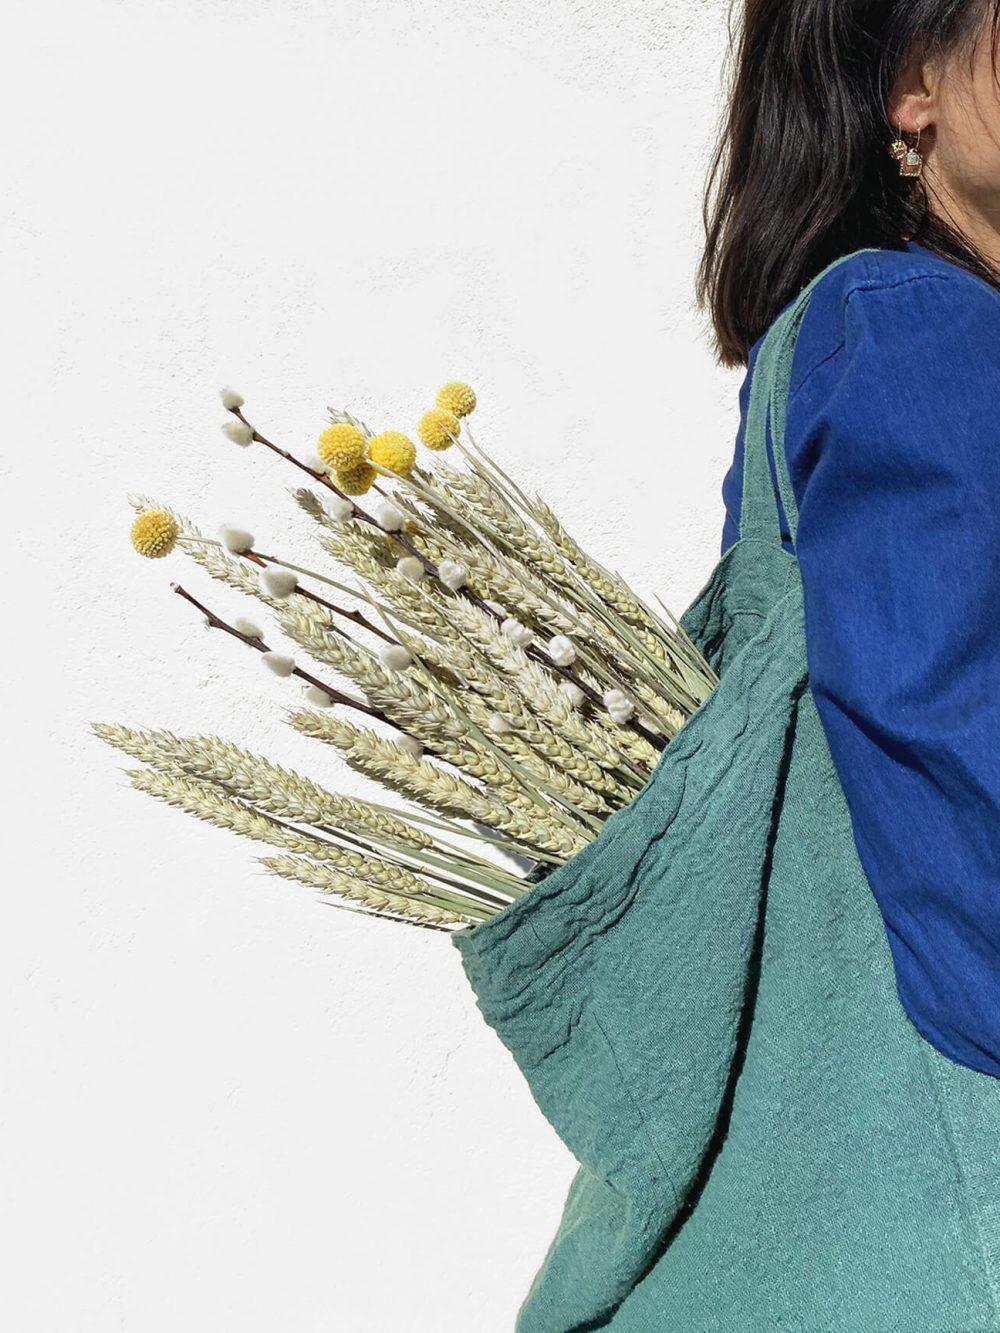 Sac de plage vegan vert eucalyptus en lin français de la marque comptoir des teintures Made in France